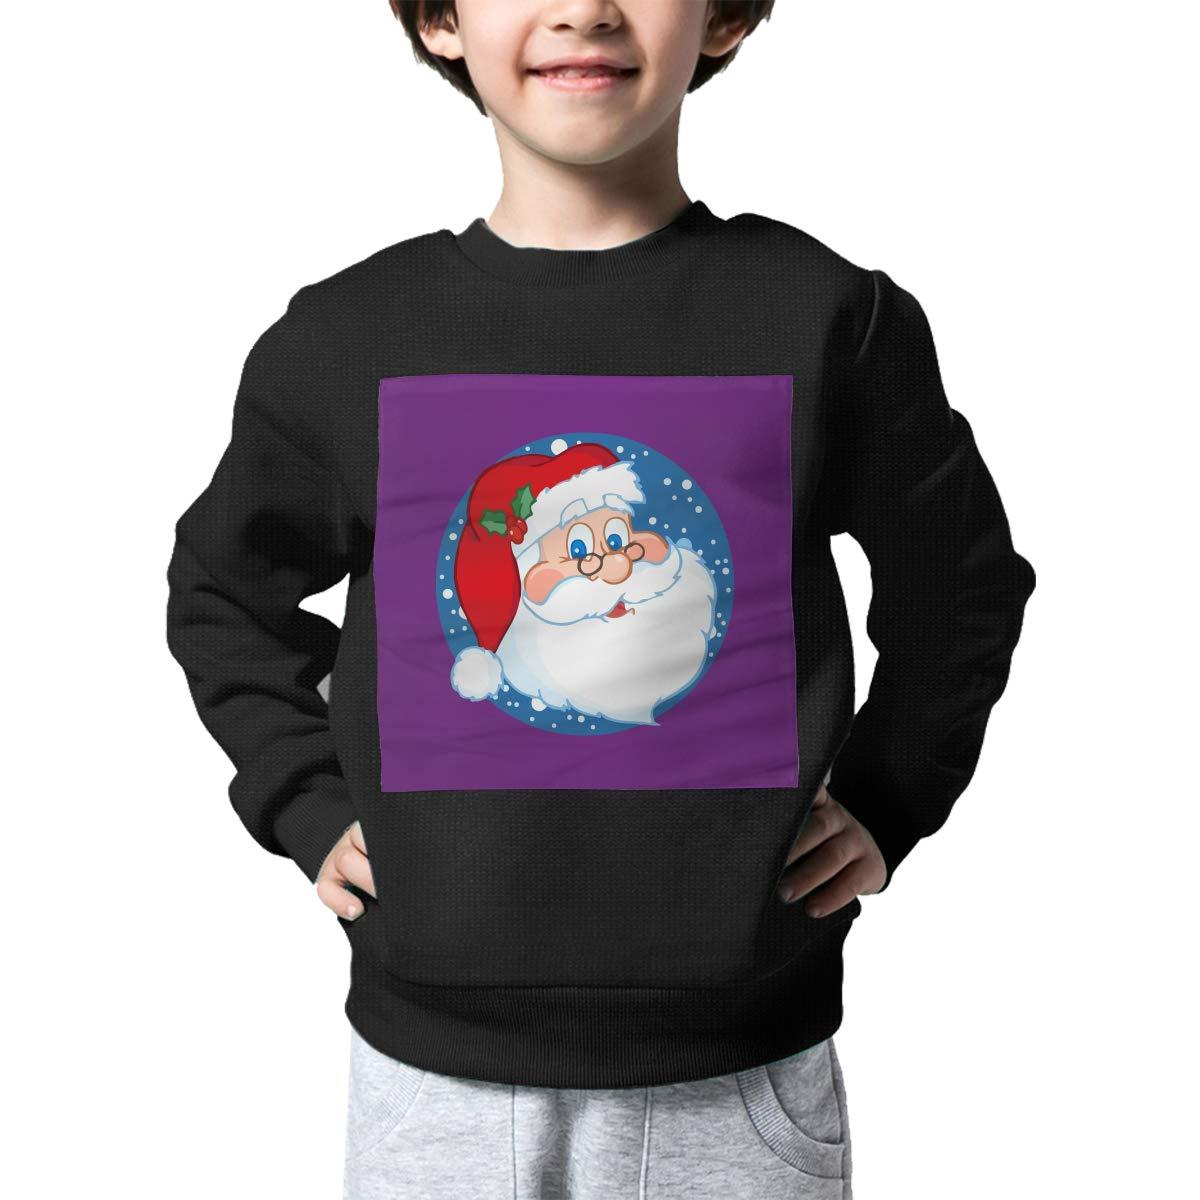 Warm/&Q90 Santa Face Toddler Childrens Print Crew Neck Sweater Long Sleeve Cute Knitted Sweatshirt